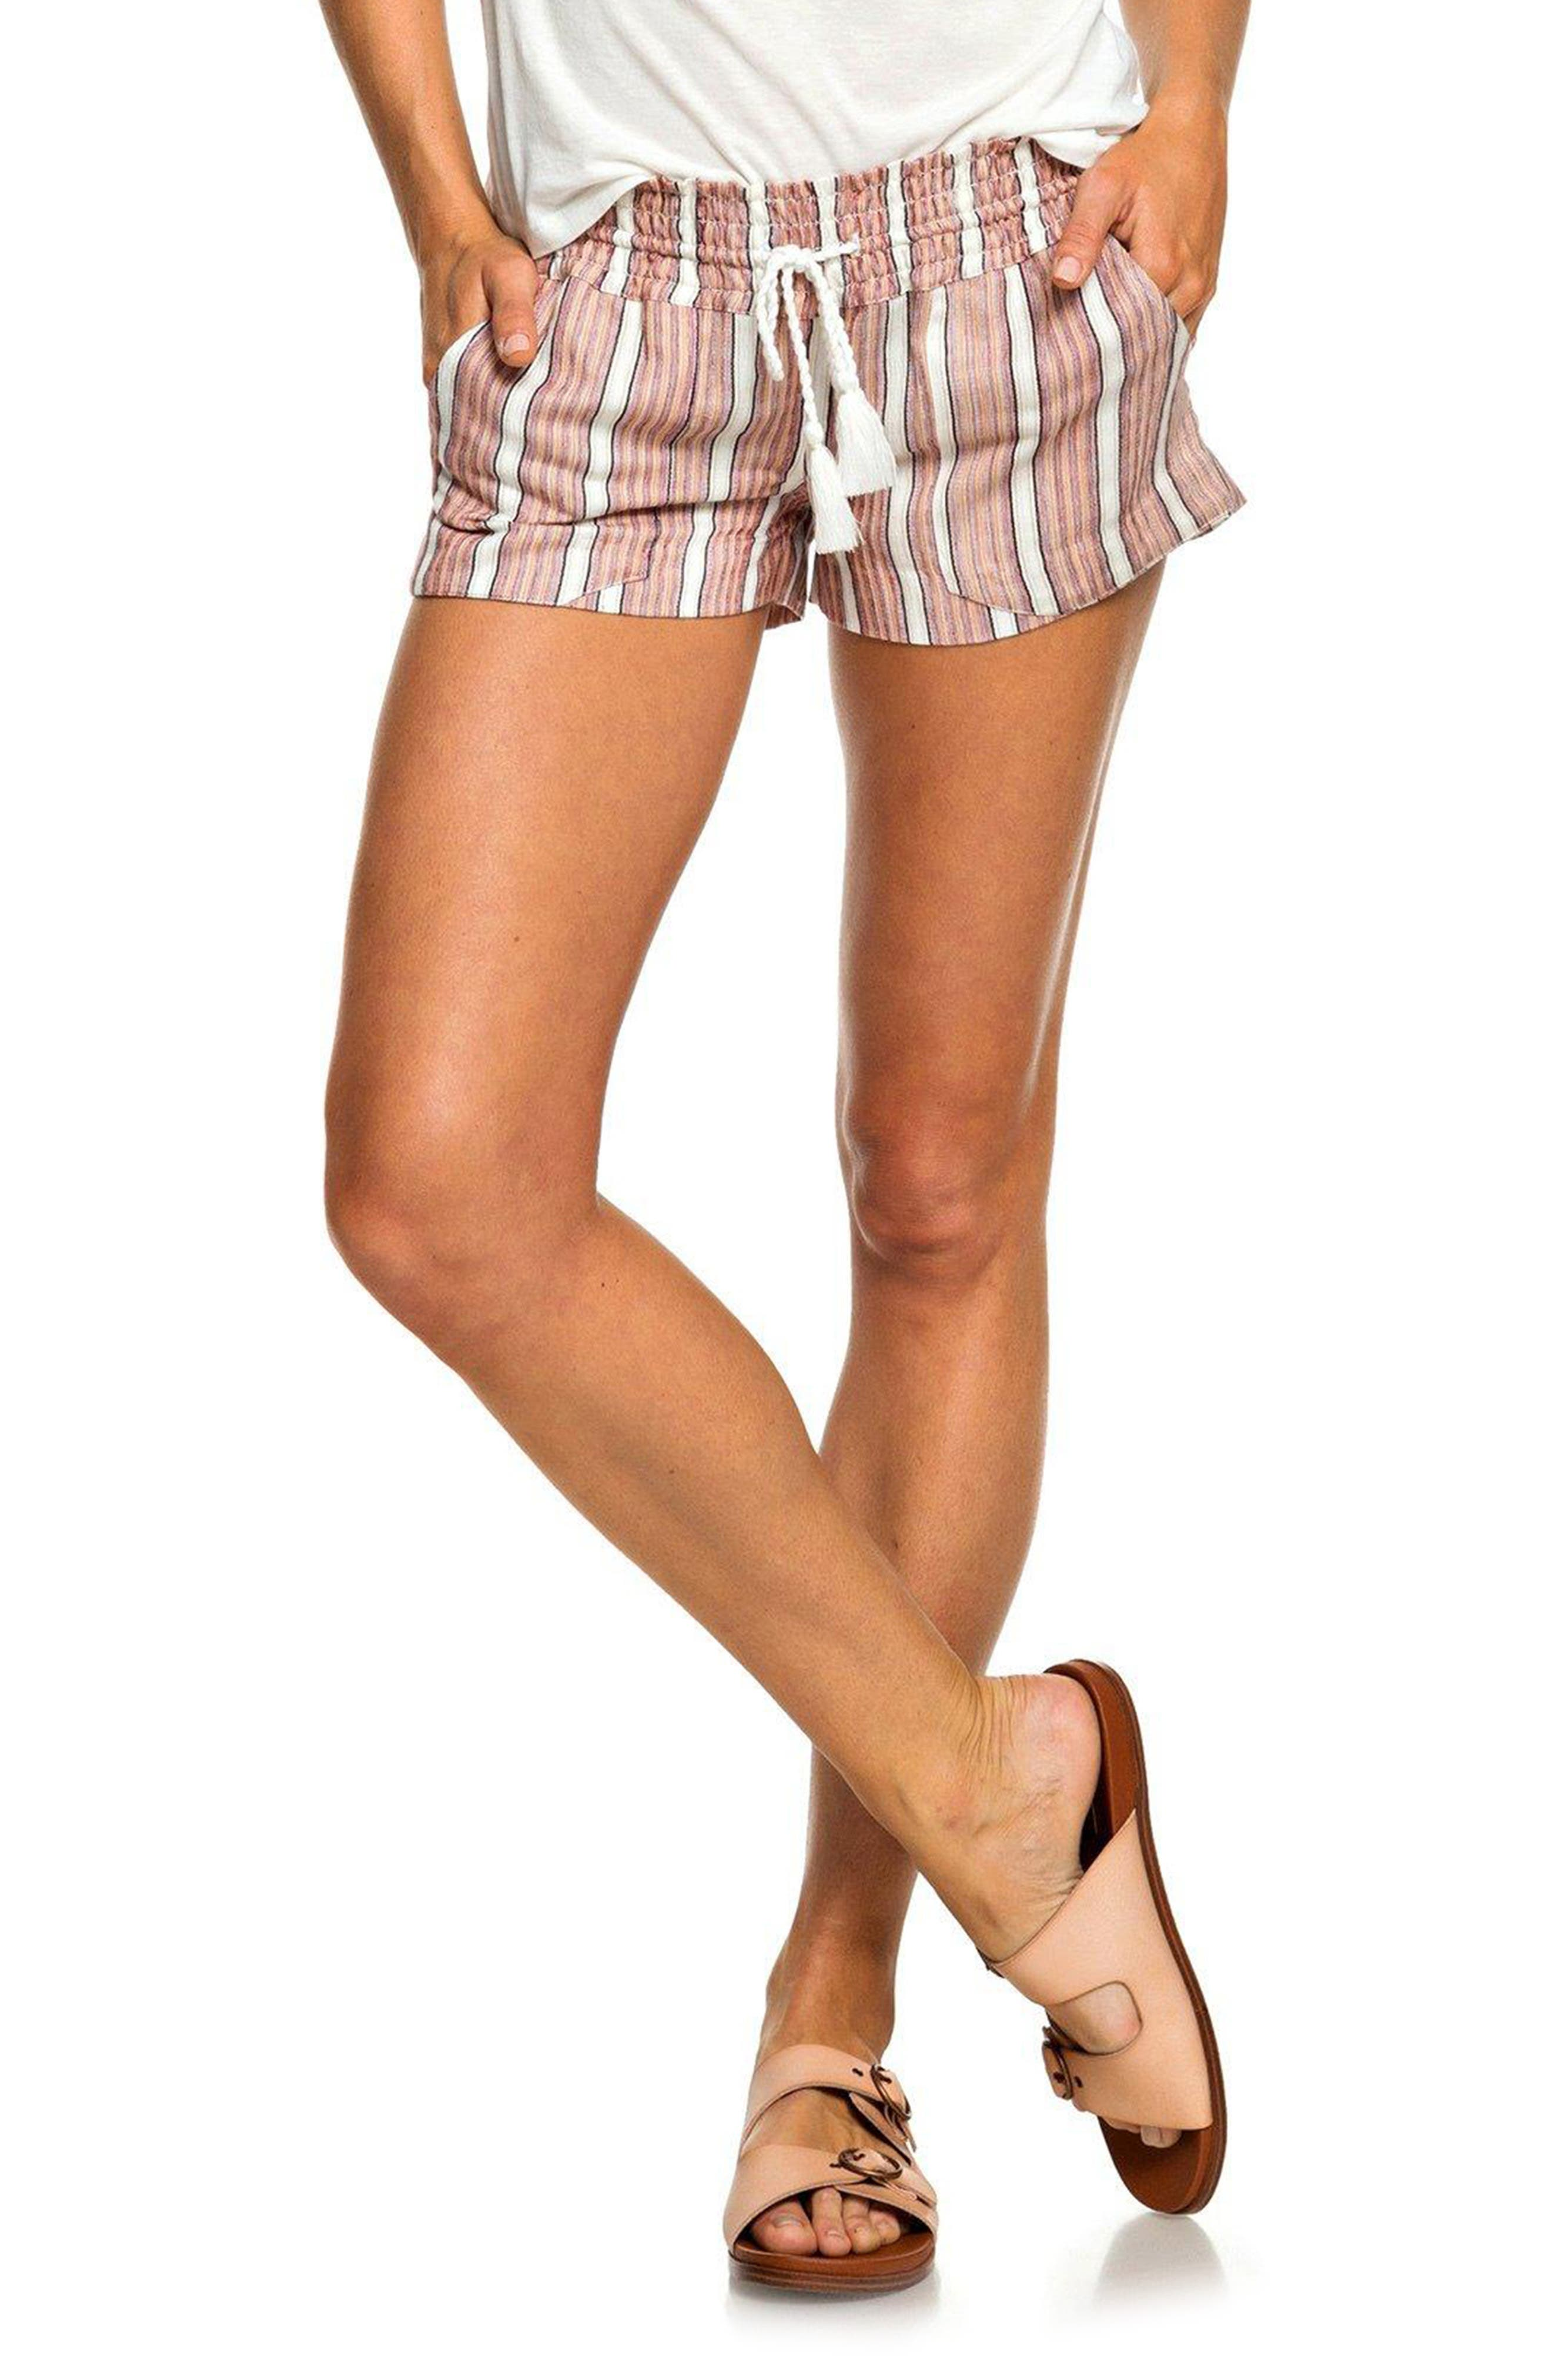 ROXY, Oceanside Stripe Shorts, Main thumbnail 1, color, 950